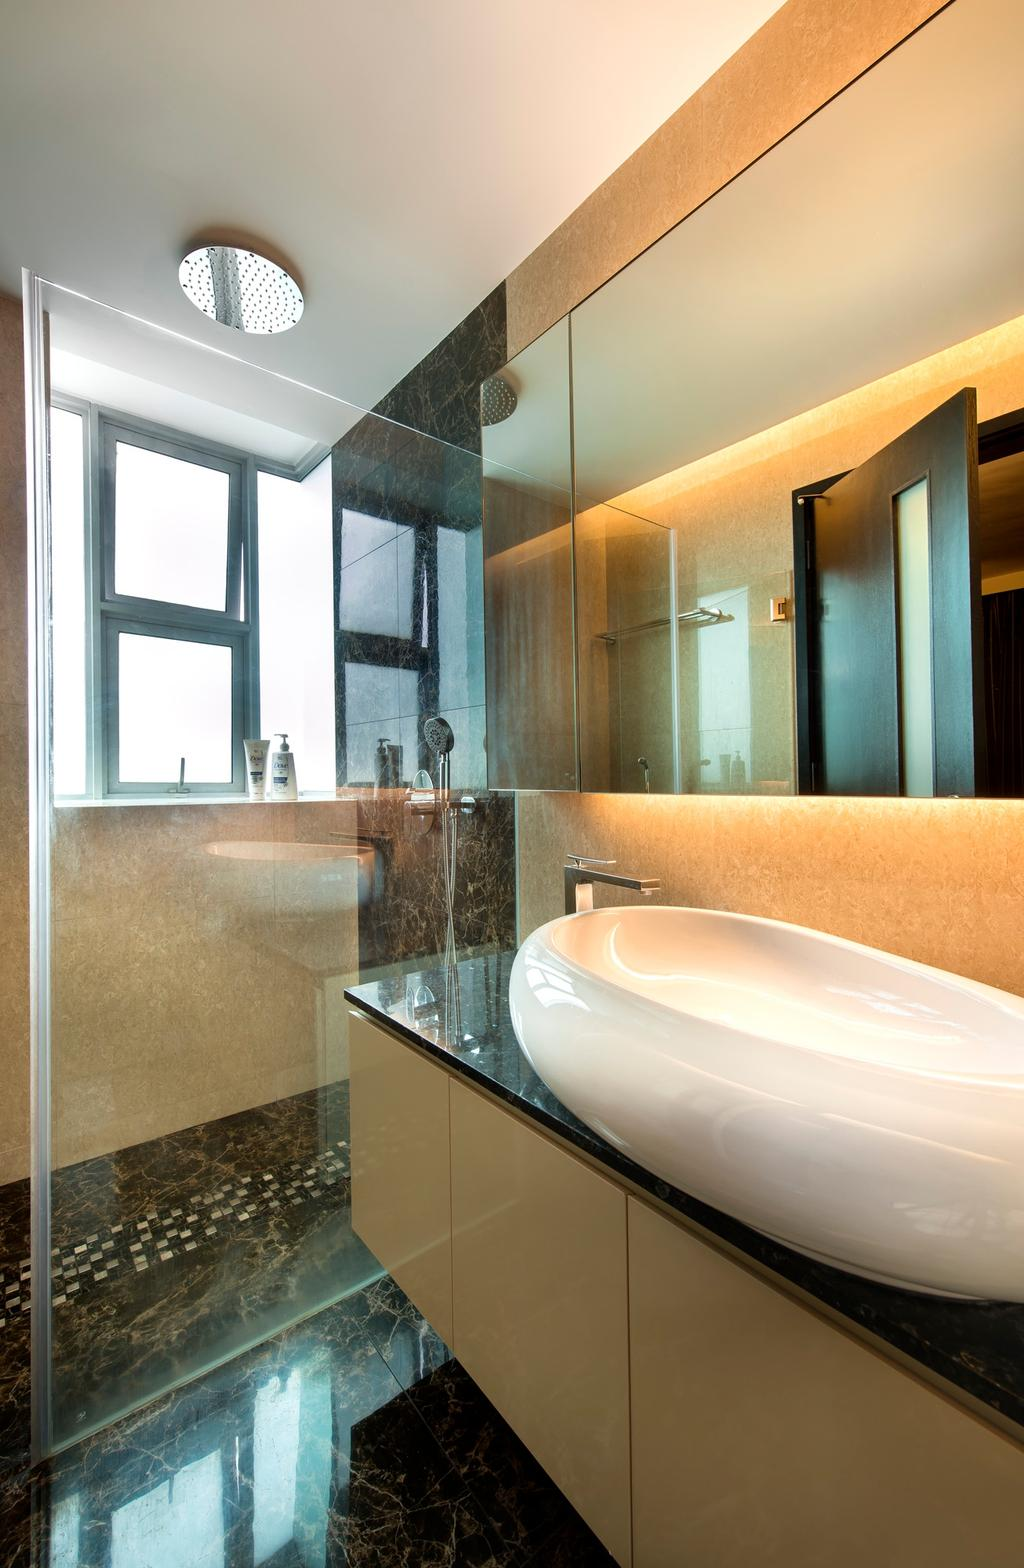 qanvast home design renovation remodelling furnishing ideas rh qanvast com